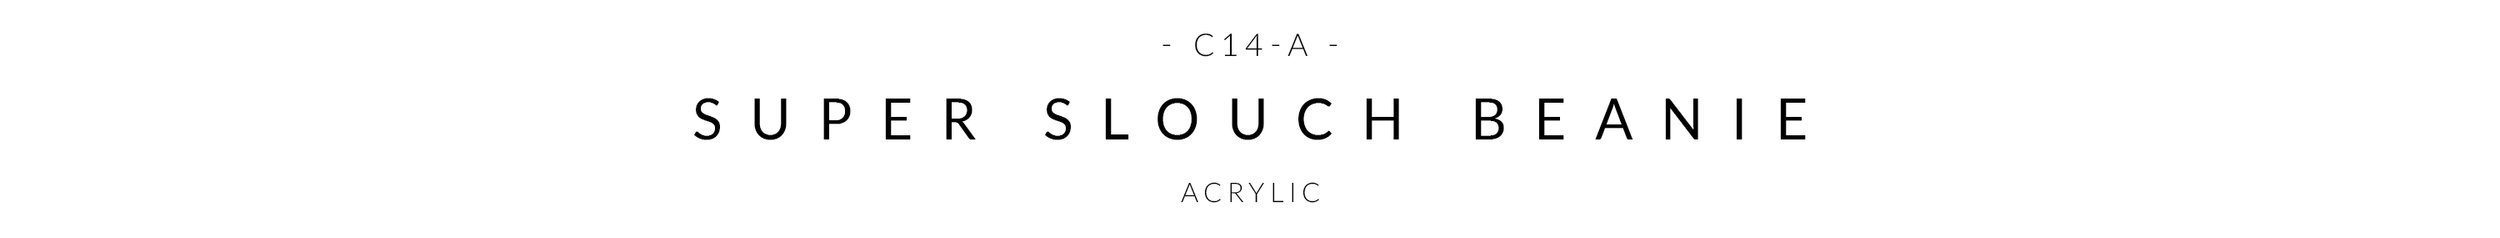 c14-a Header